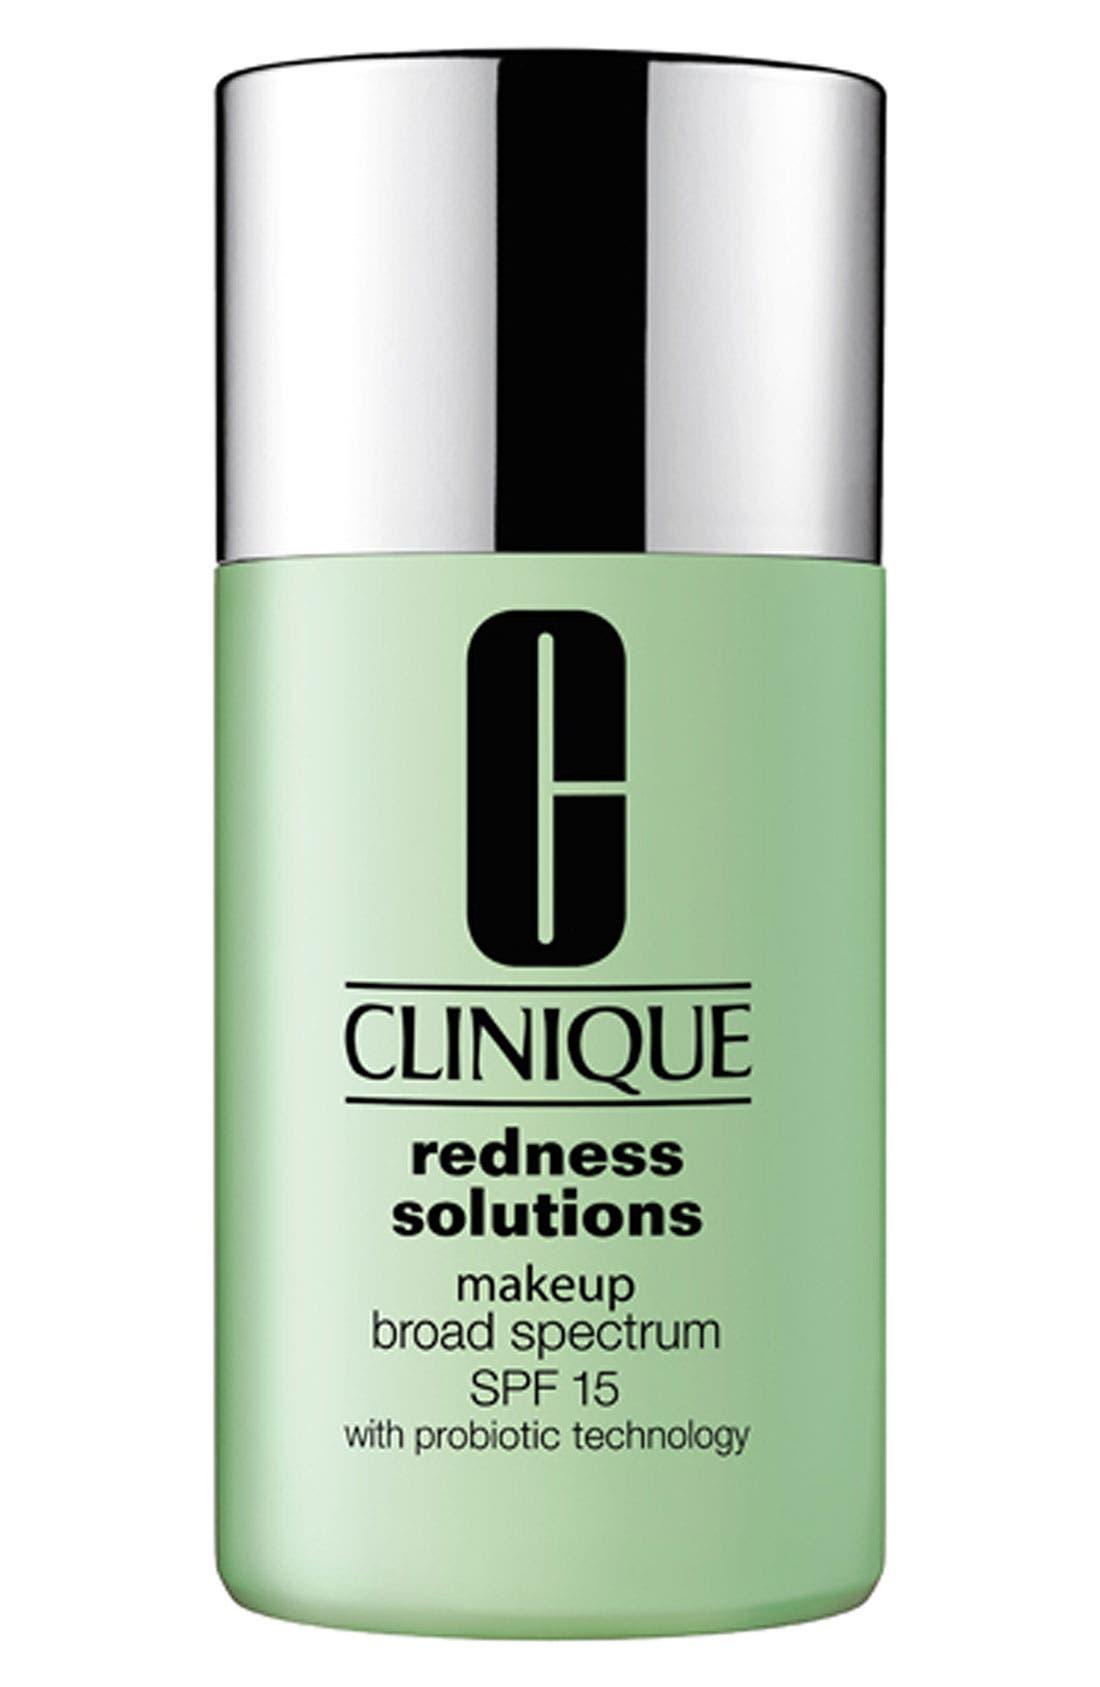 Redness Solutions Makeup Foundation Broad Spectrum Spf 15